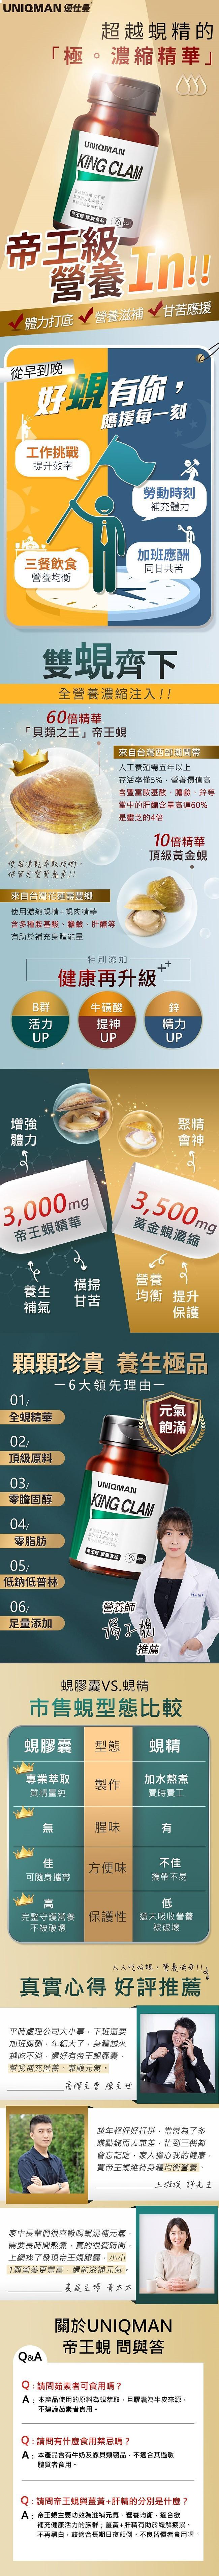 UNIQMAN-帝王蜆膠囊食品(60粒/瓶)產品資訊